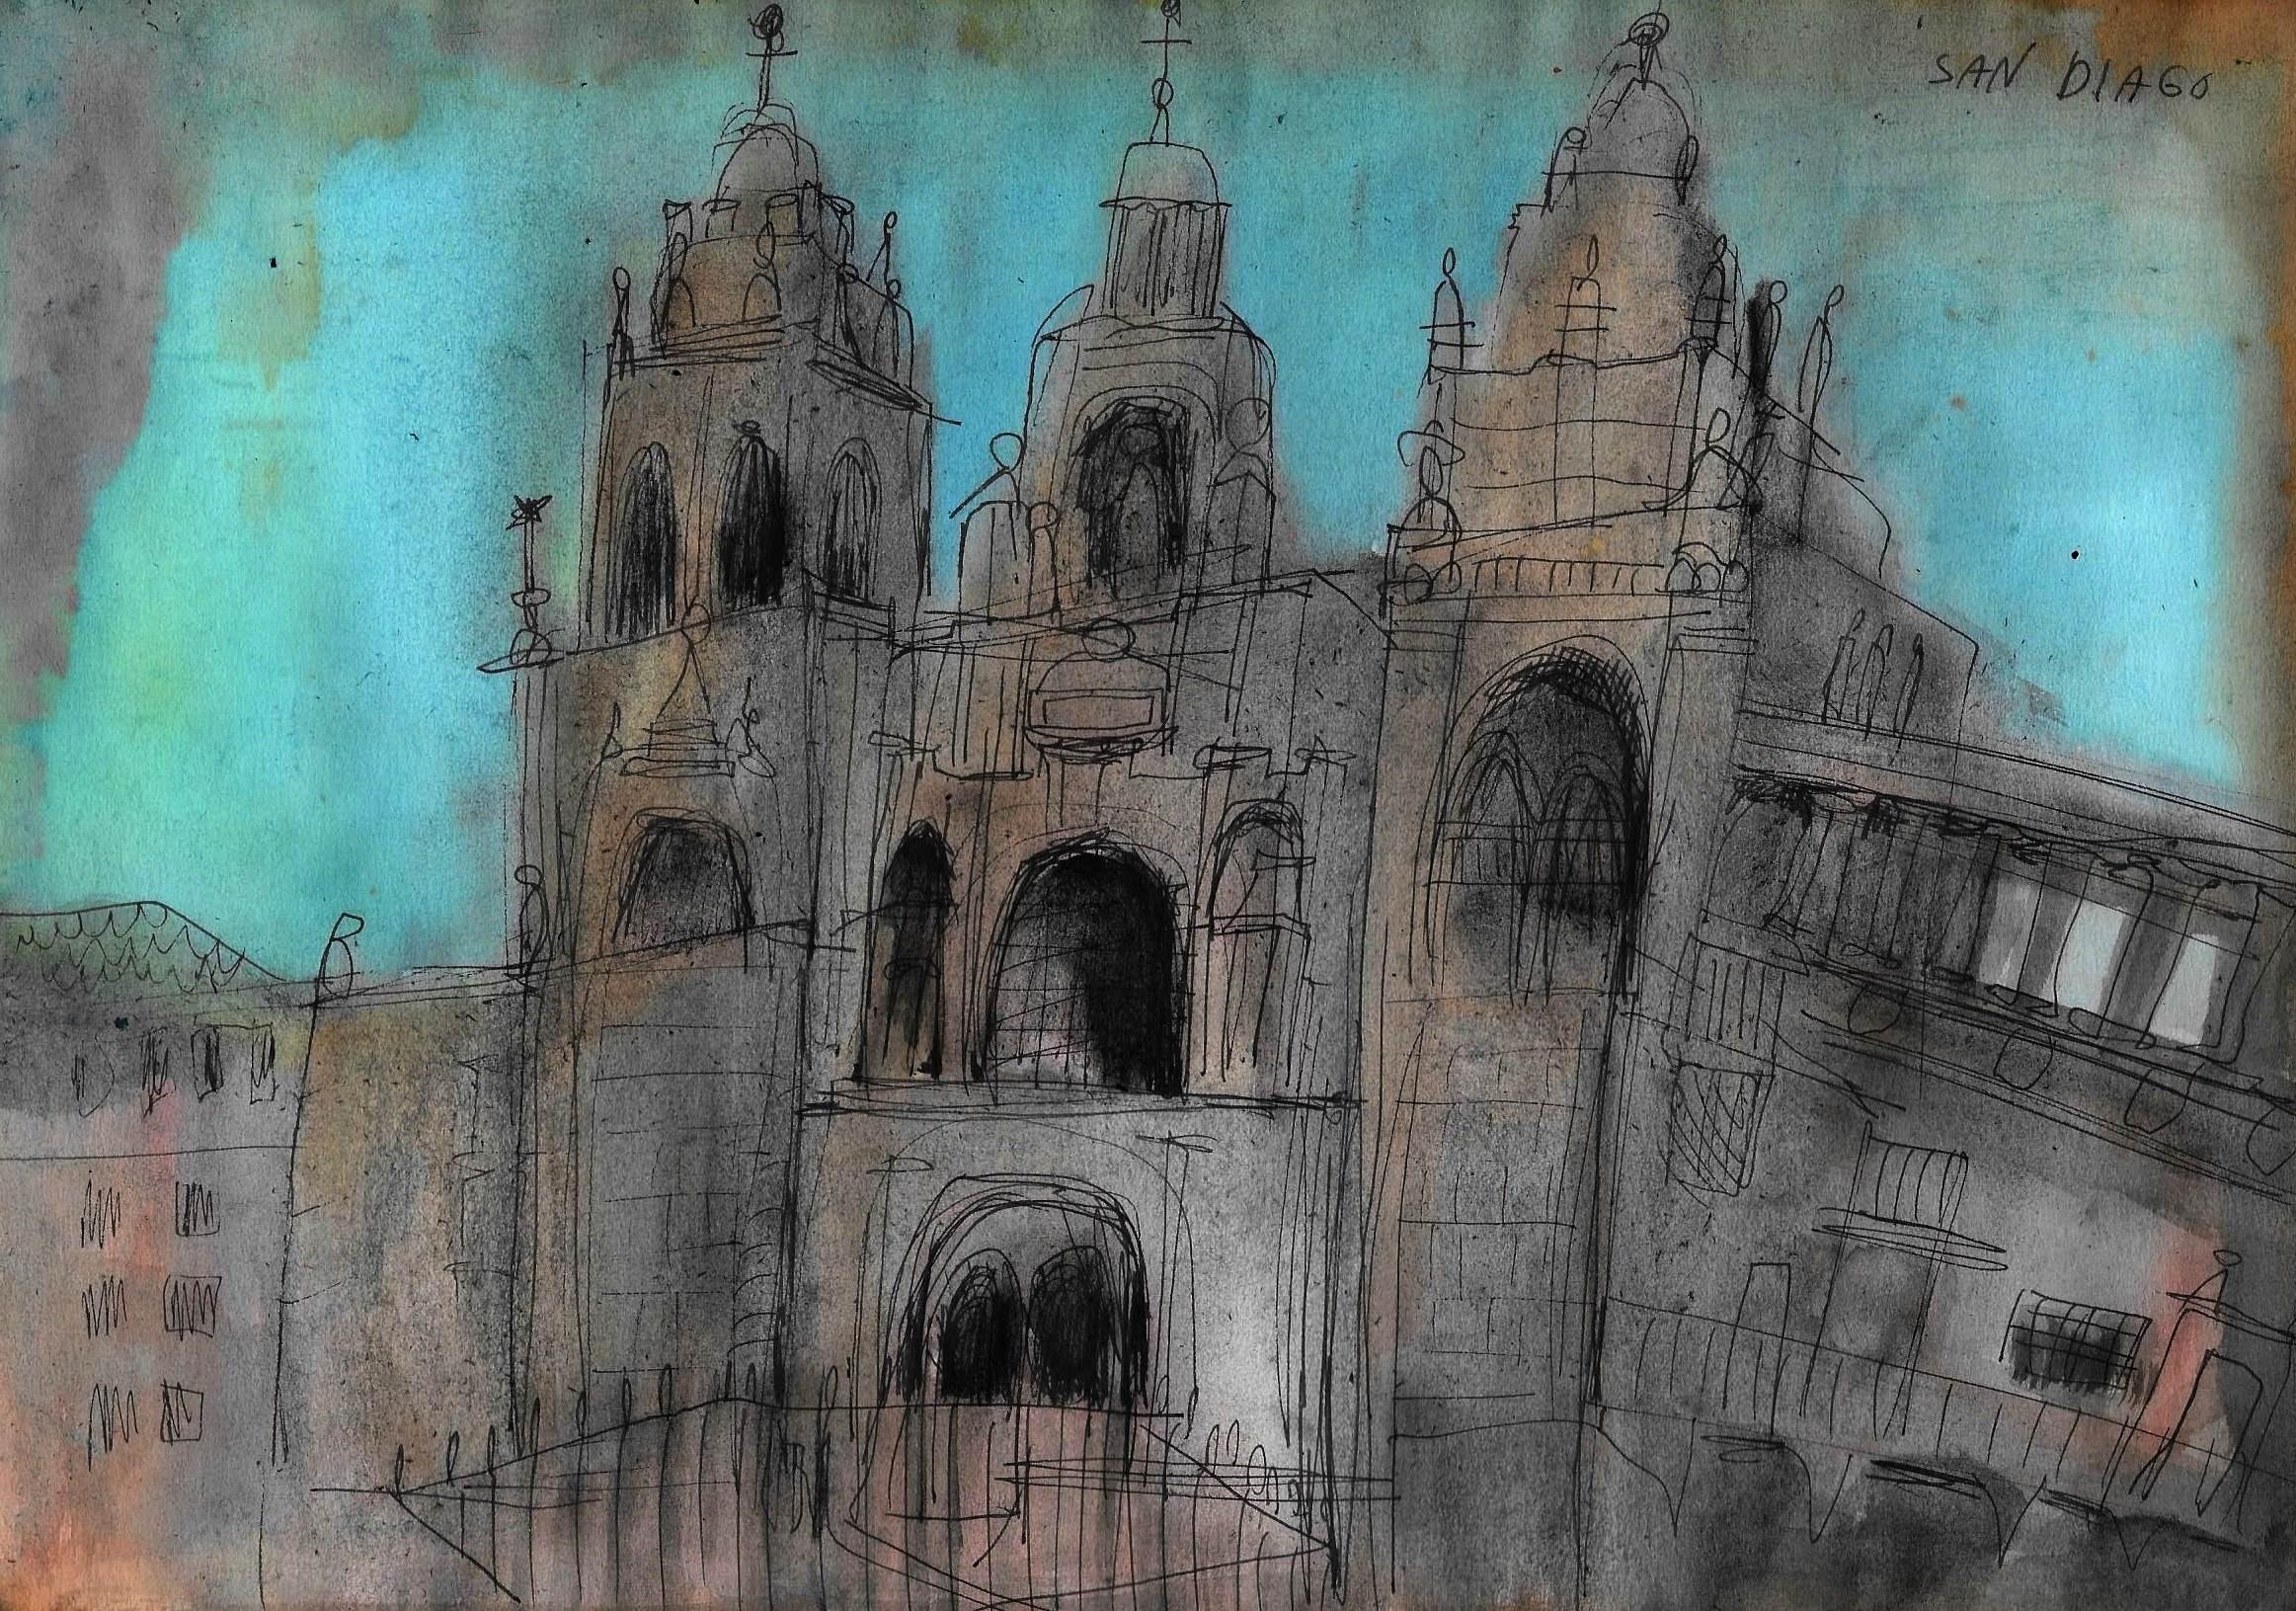 Einat Aloni - Santiago de Compostela, mixed media on paper, 30X20 cm